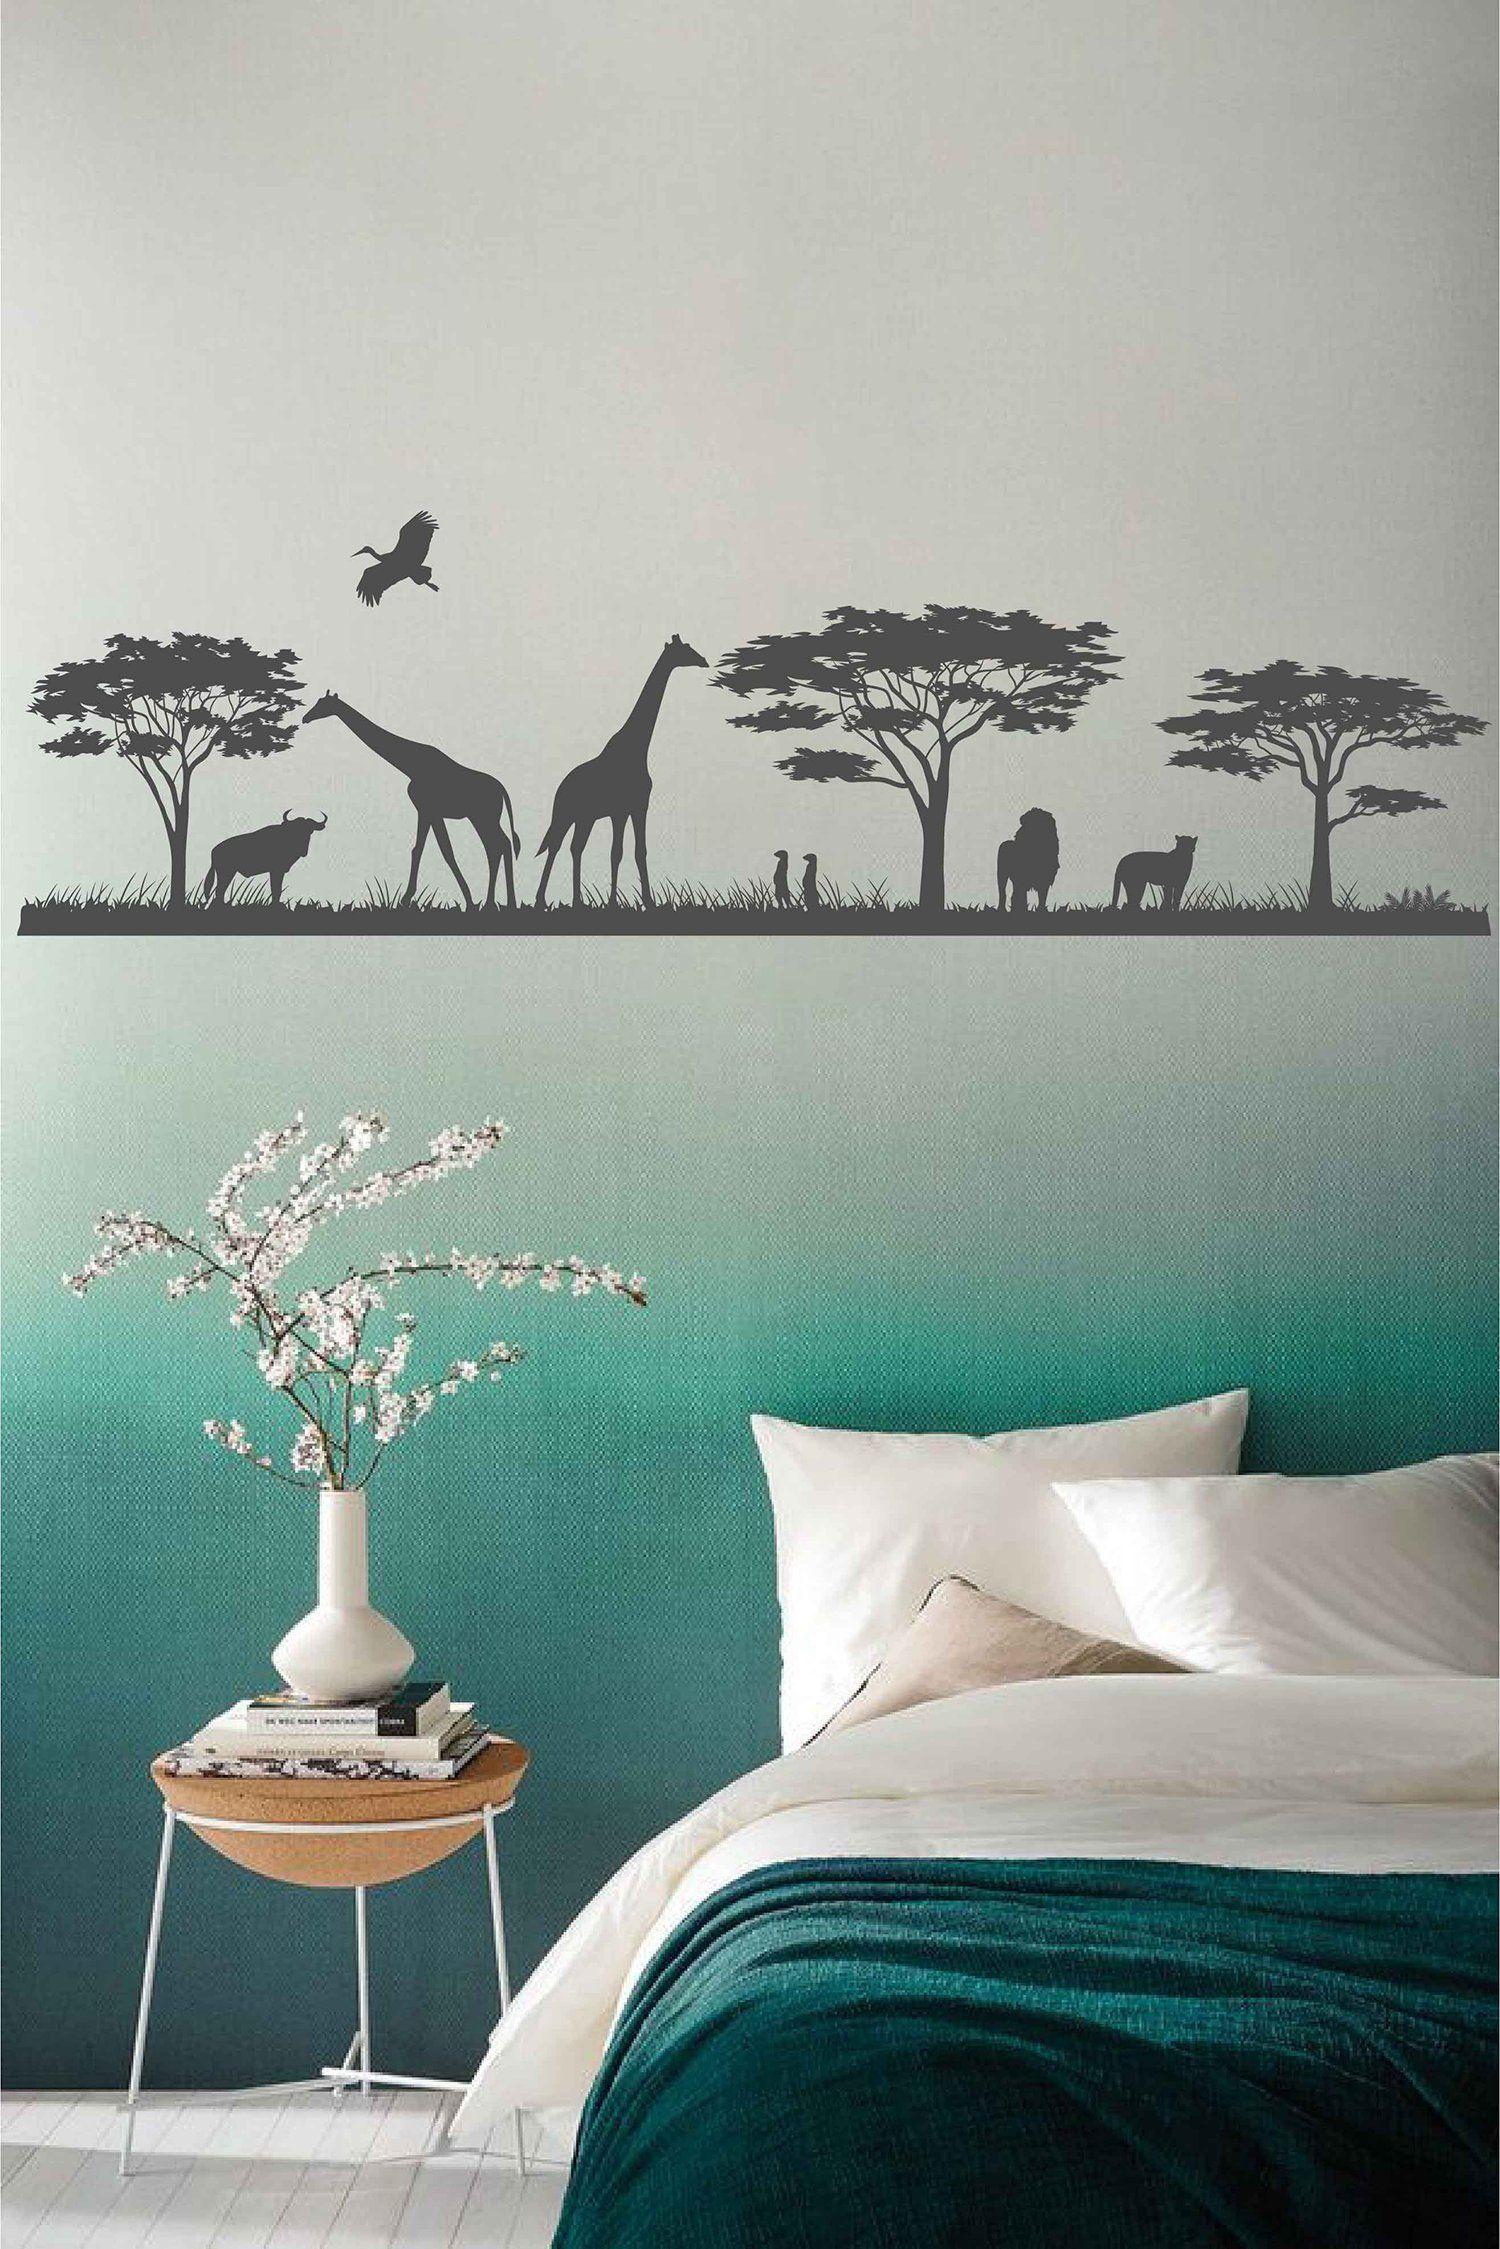 Safari Wild Animals Wall Decal Jungle Wall Decal African Safari Decal Vinyl Sticker Bedroom Nursery Decor Animal Wall Art Nursery Ik3695 Animal Wall Decals Animal Wall Decor Jungle Wall Decals